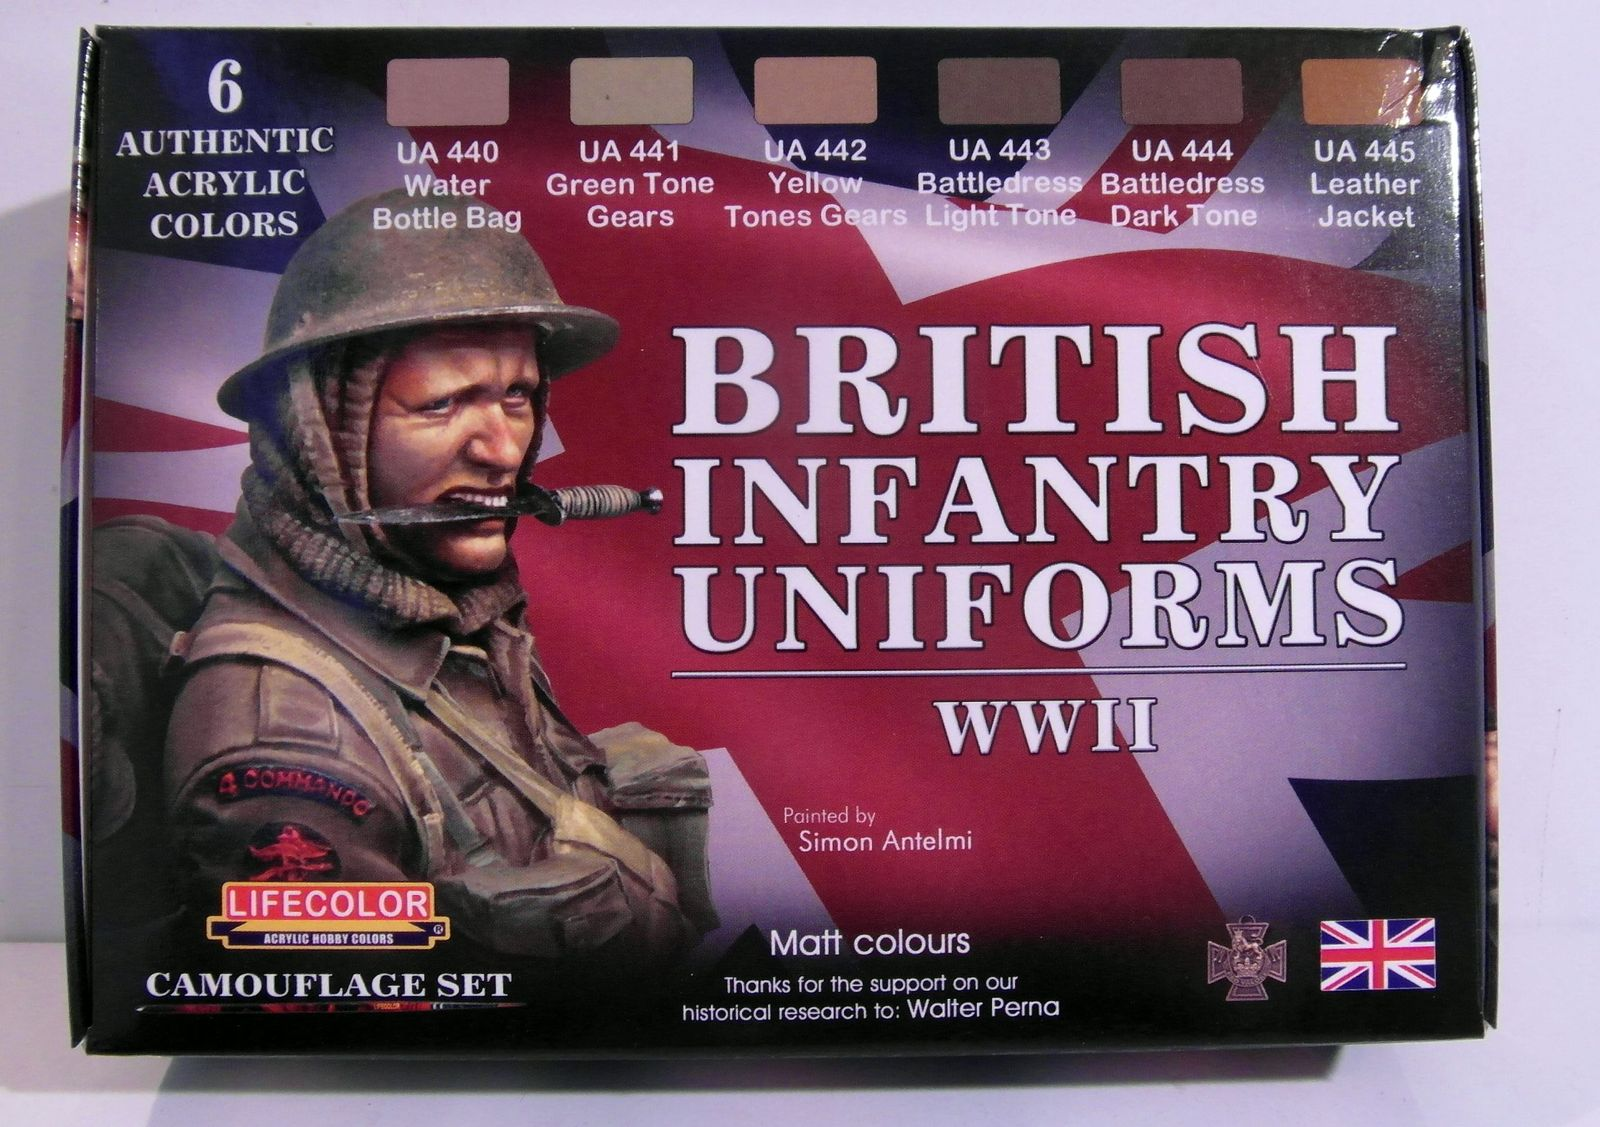 [Lifecolor] - British infantry uniforms WWII CS41-001